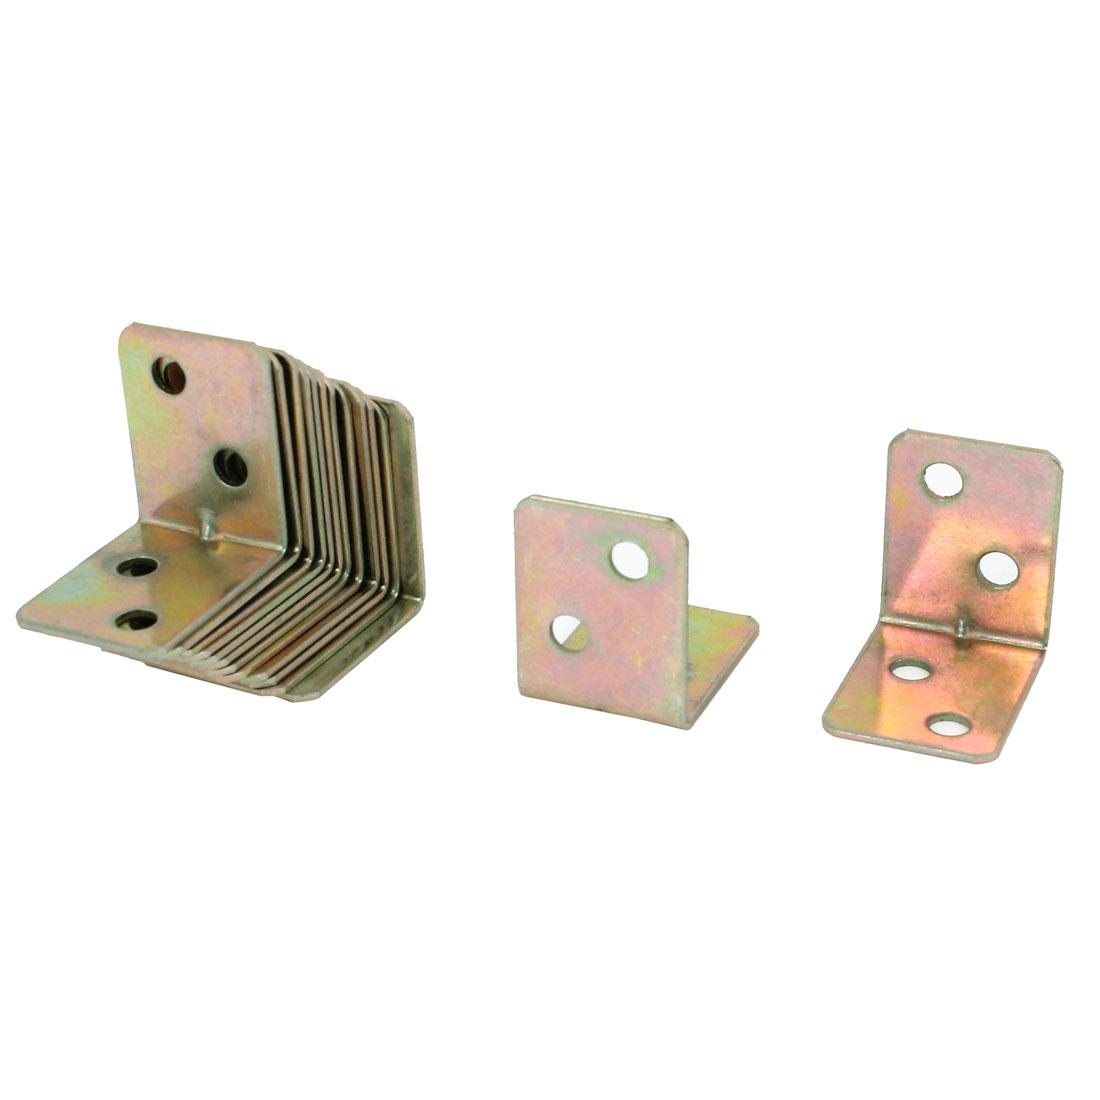 15 Pcs 25mm x 25mm Chair Door Right Angle Brackets Corner Braces Bronze Tone